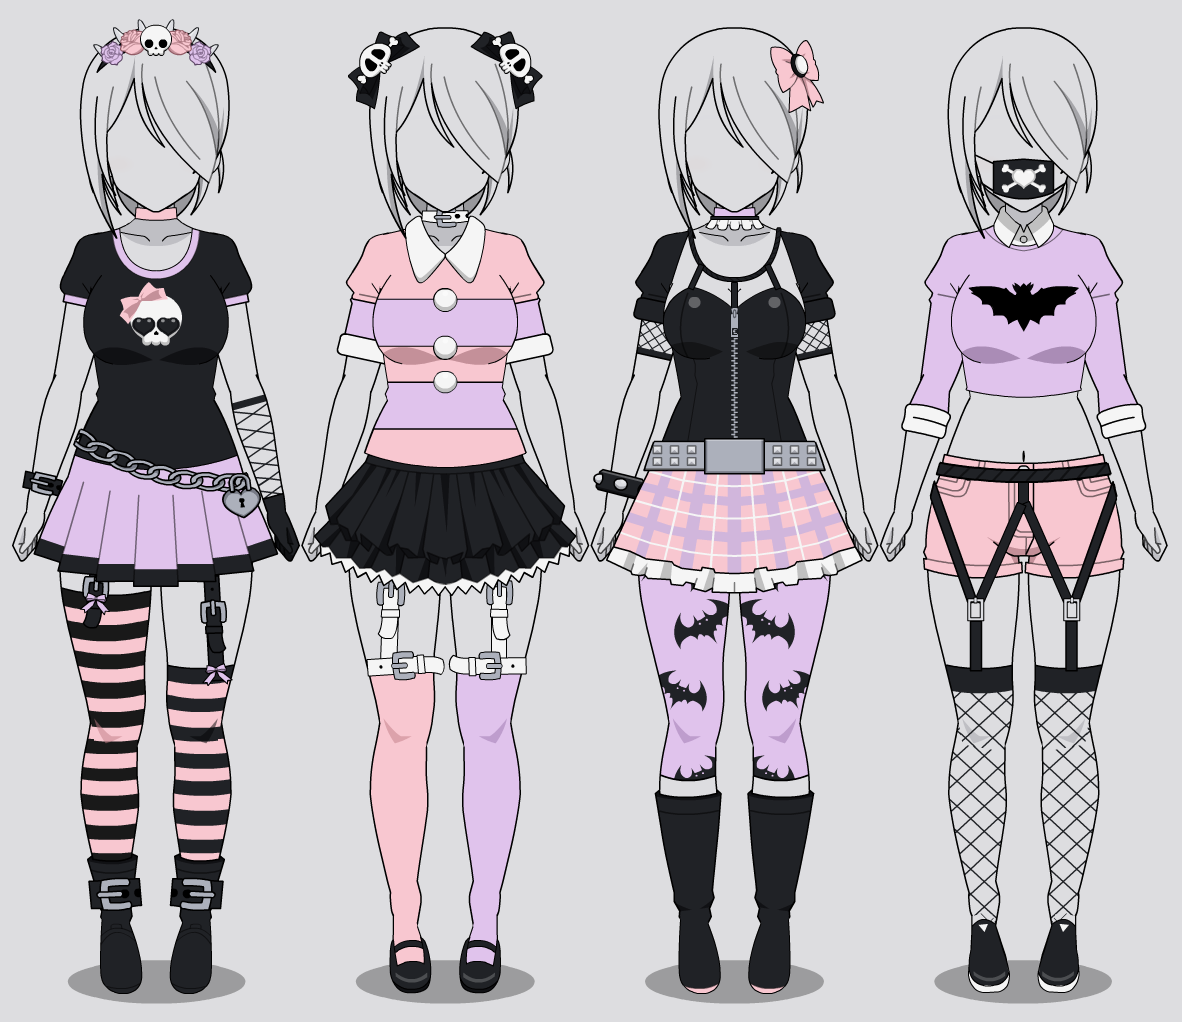 Kisekae Four Pastel Goth Outfits W Codes By Rainbowfan256 On Pastel Goth Outfits Goth Outfits Pastel Goth Fashion